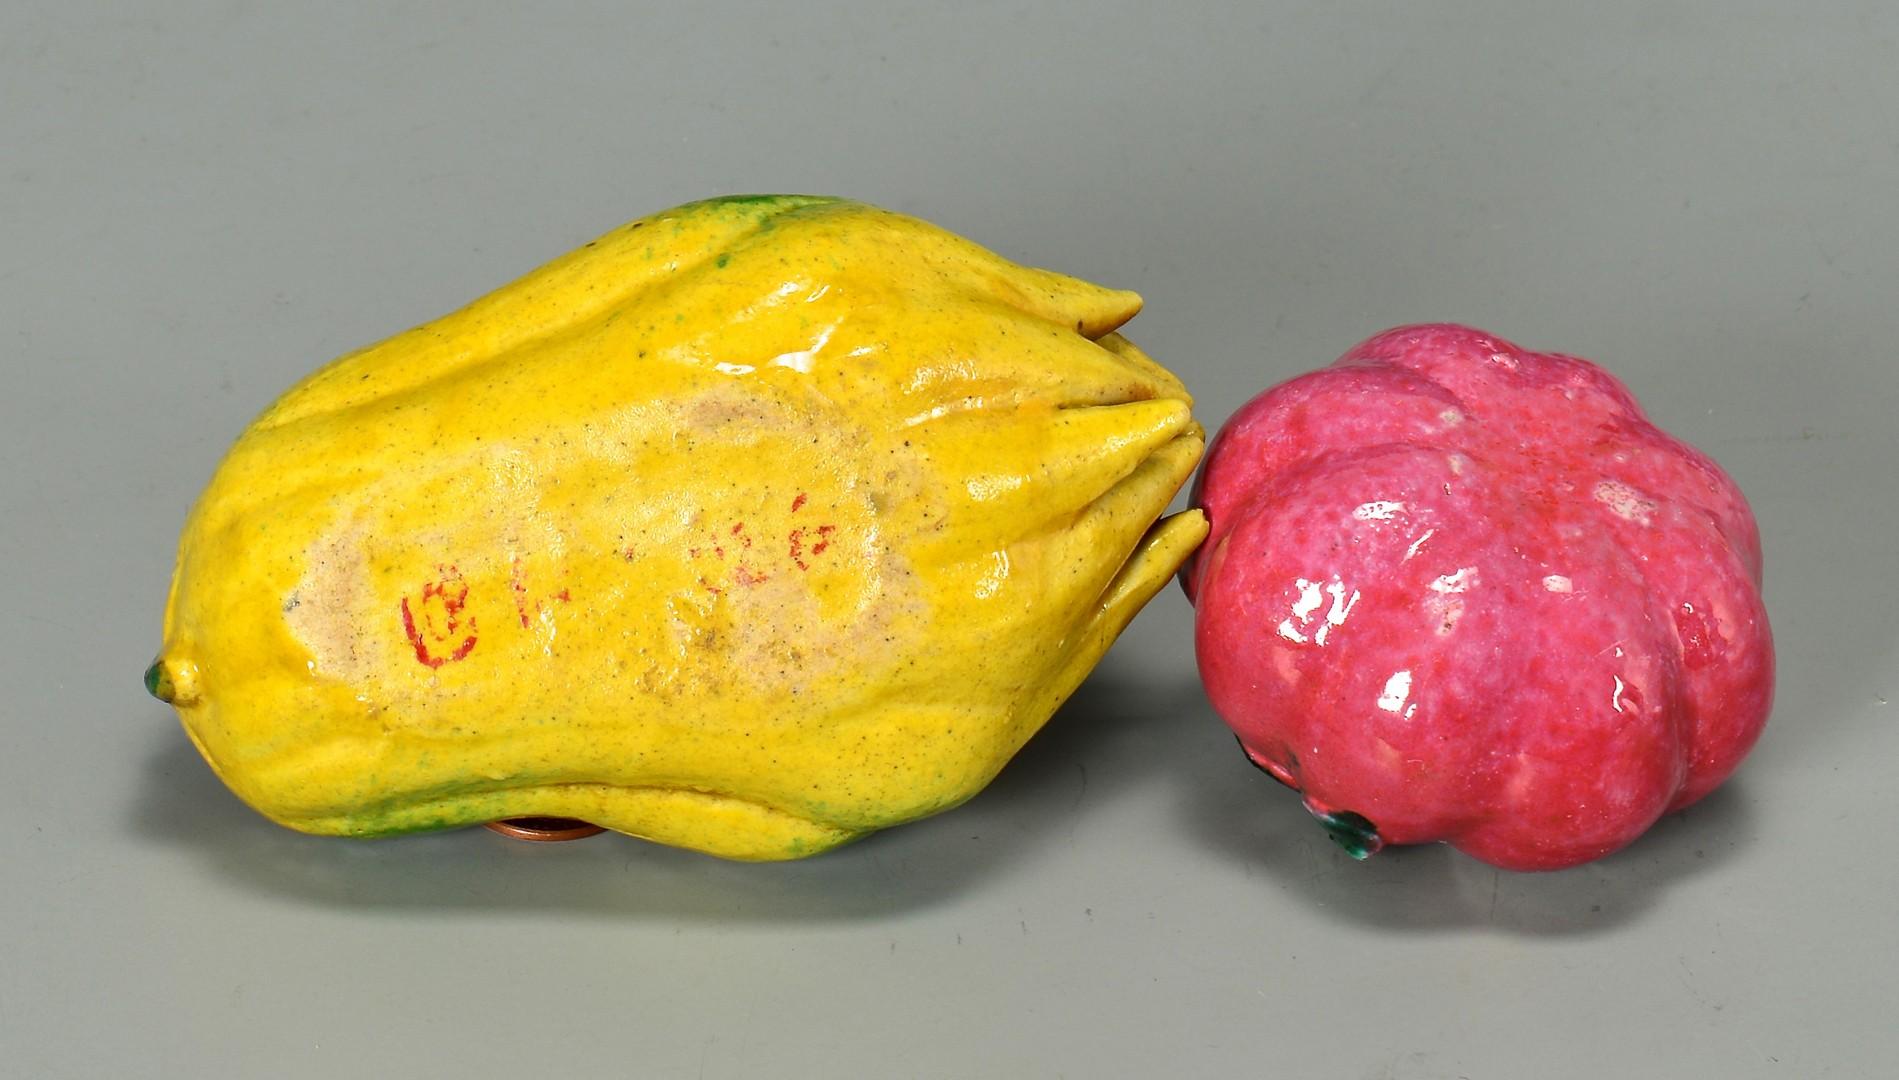 Lot 23: Chinese Altar Fruit, 6 pcs